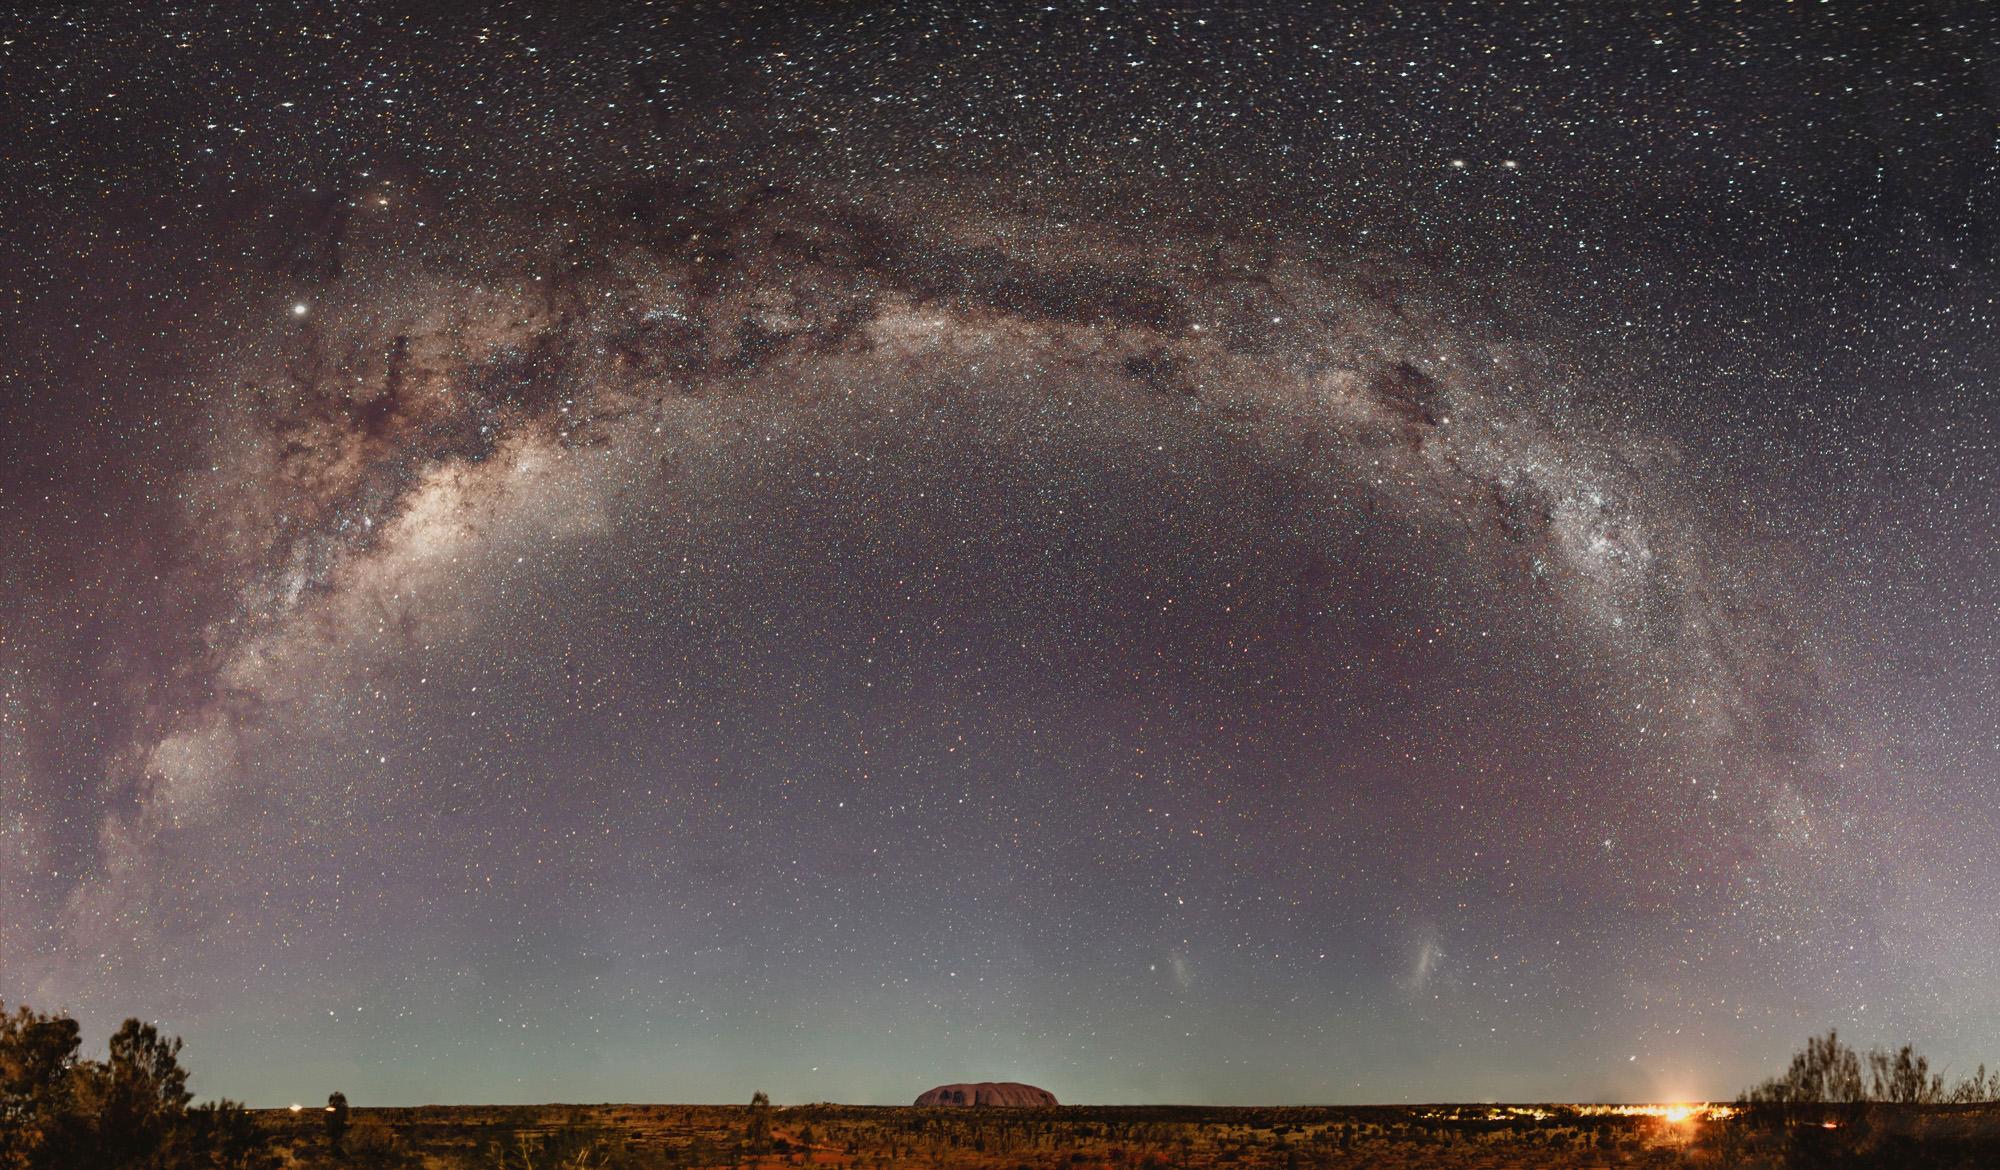 Uluru under the milky way of stars